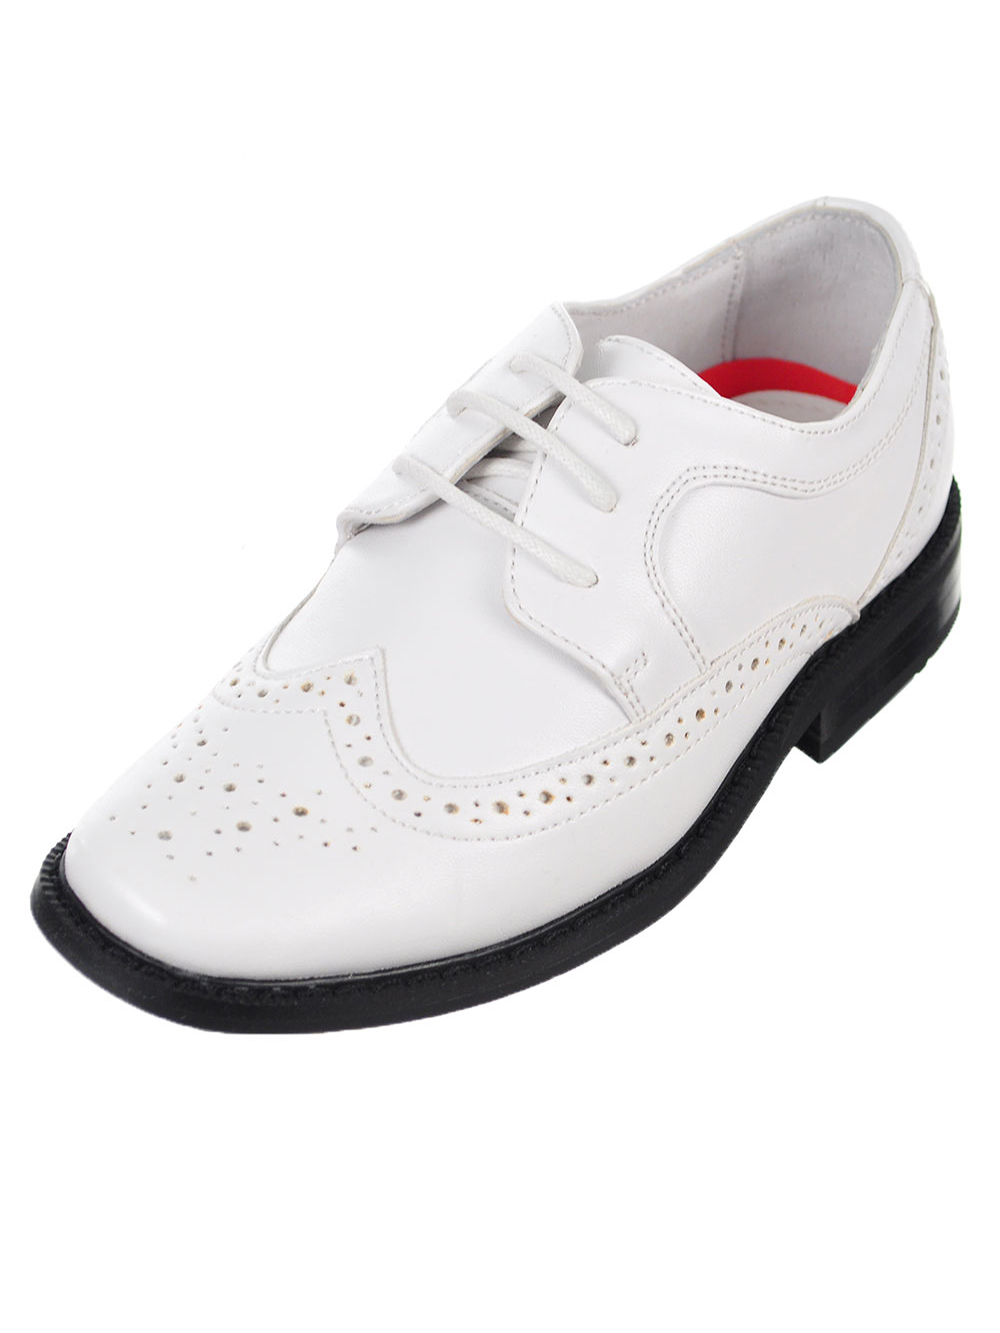 "Joseph Allen Boys' ""Worsted Wingtip"" Dress Shoes (Toddler Sizes 9 - 12)"